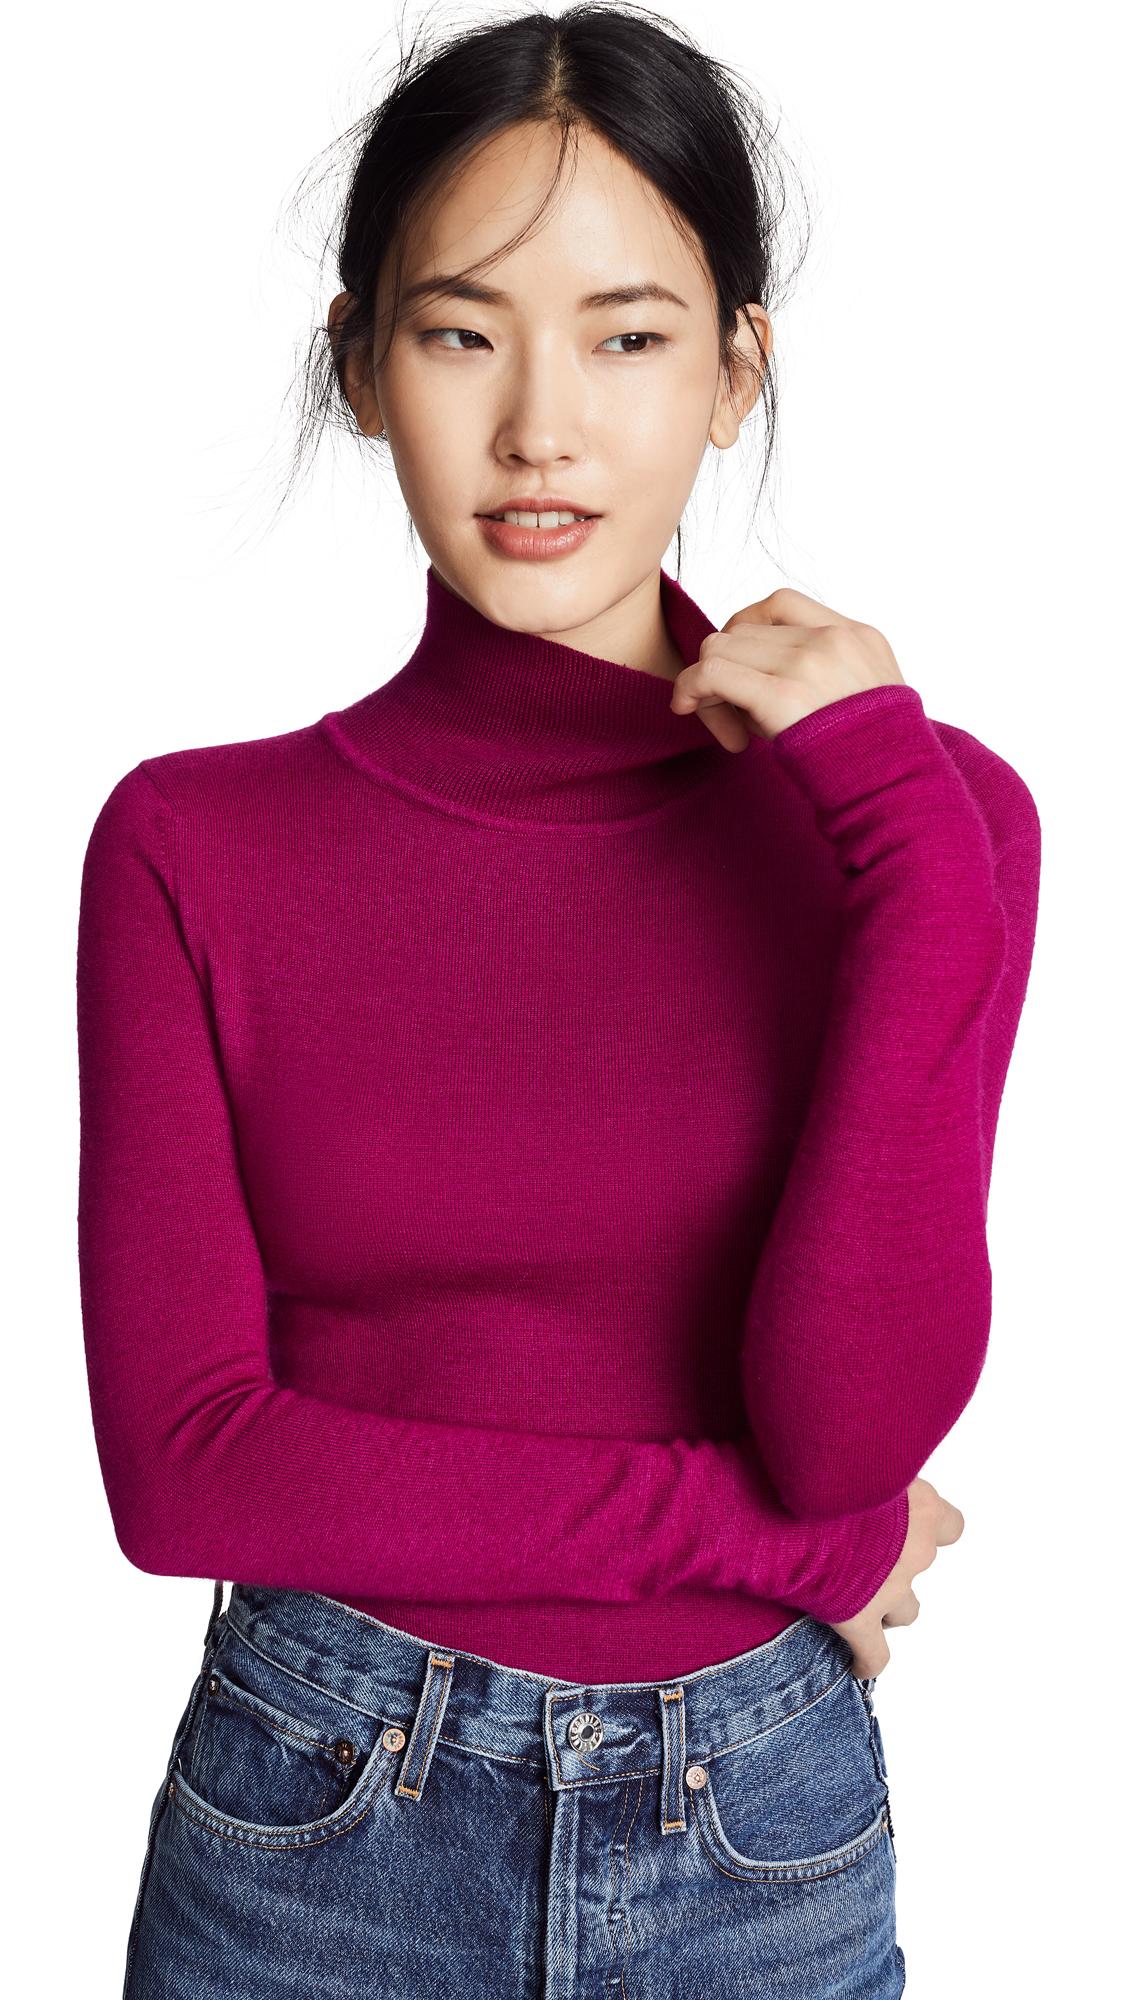 Prabal Gurung Carina Cashmere Turtleneck Sweater In Raspberry